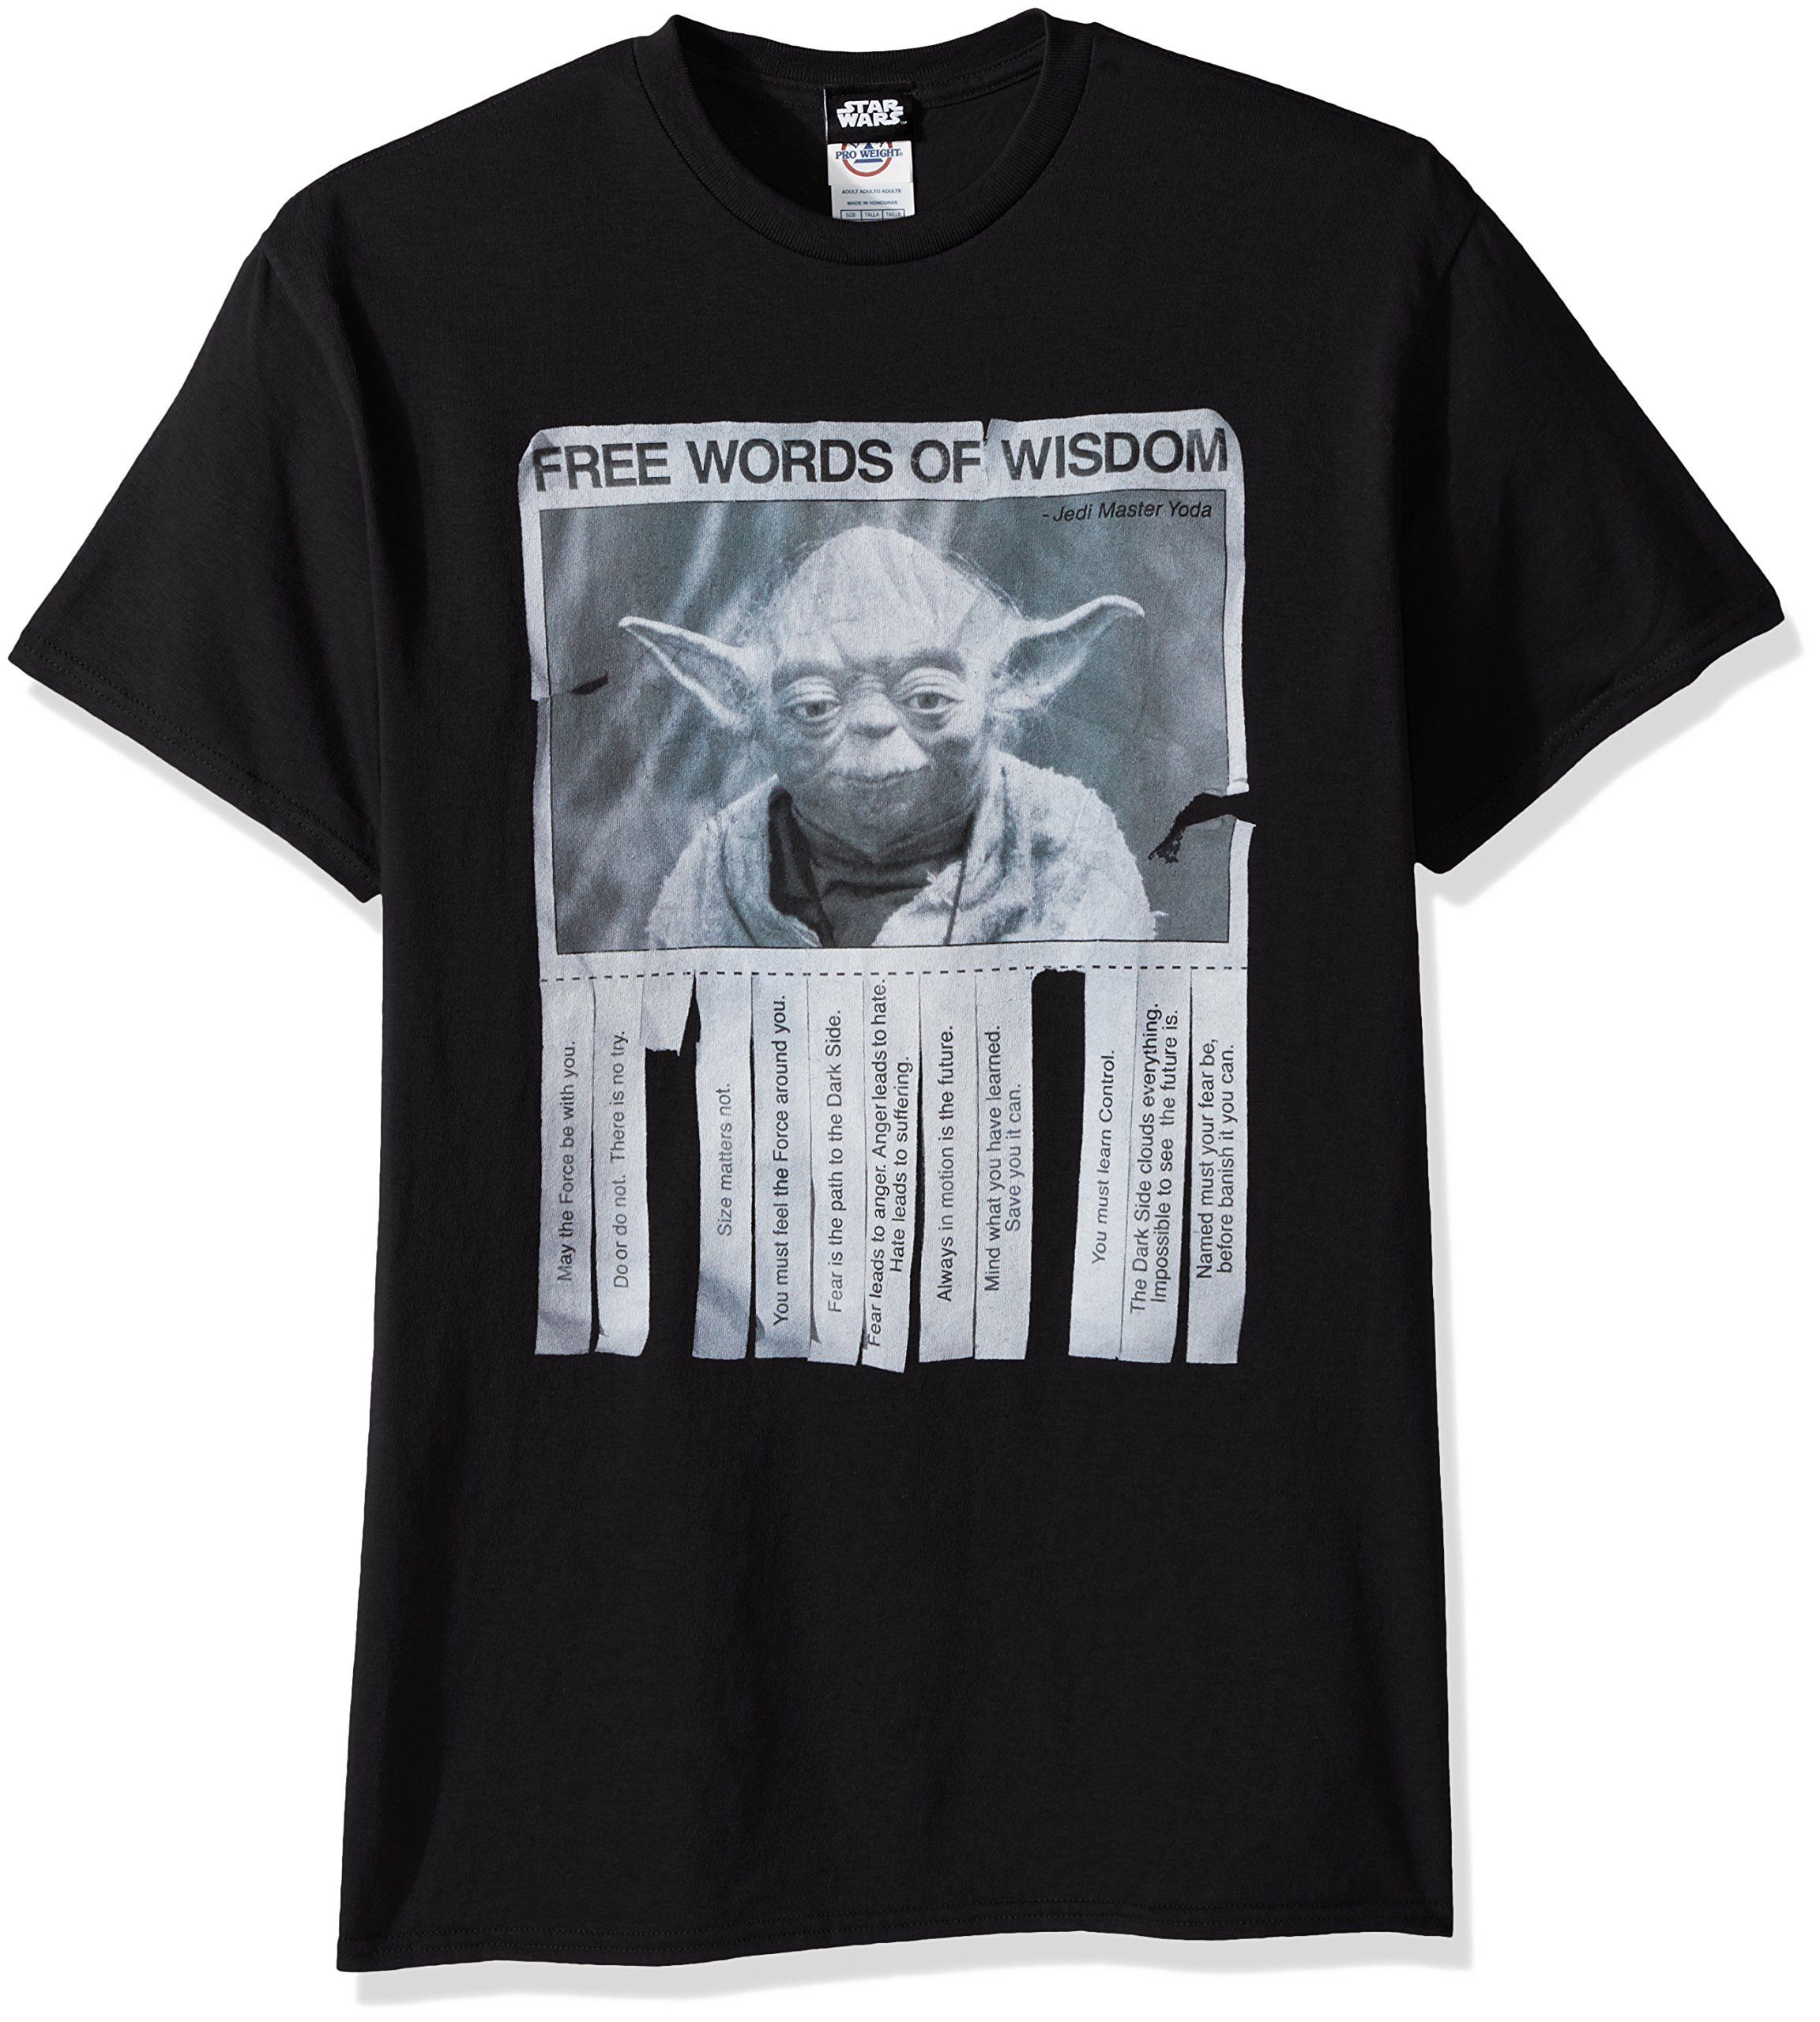 Star Wars Men's Words of Wisdom T-Shirt, Black, X-Large